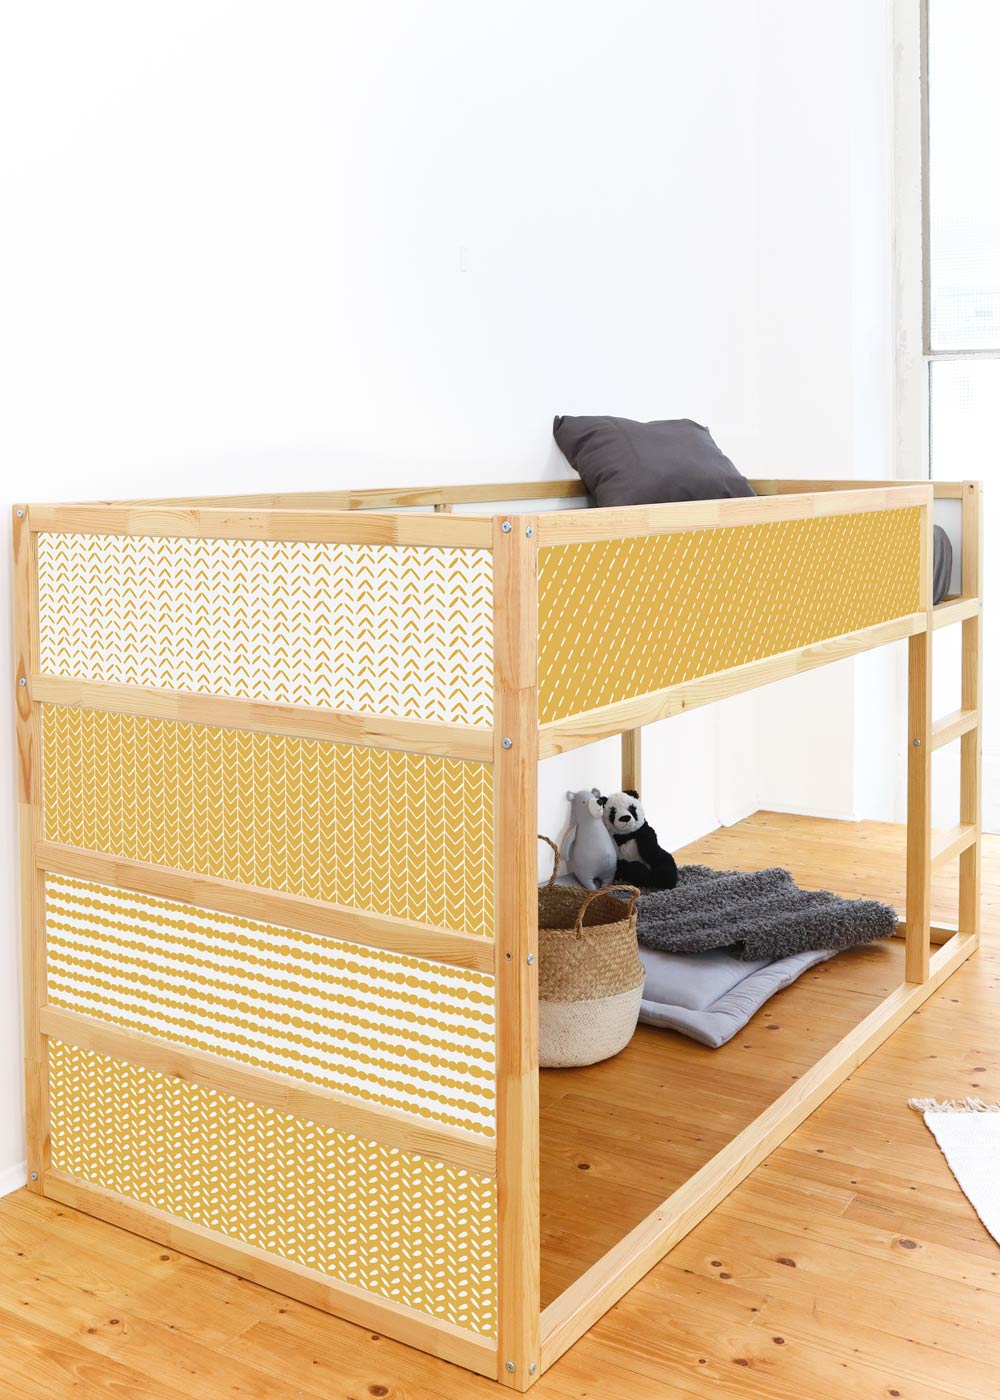 Ikea Kuras Hochbett Musta senf Seitenansicht